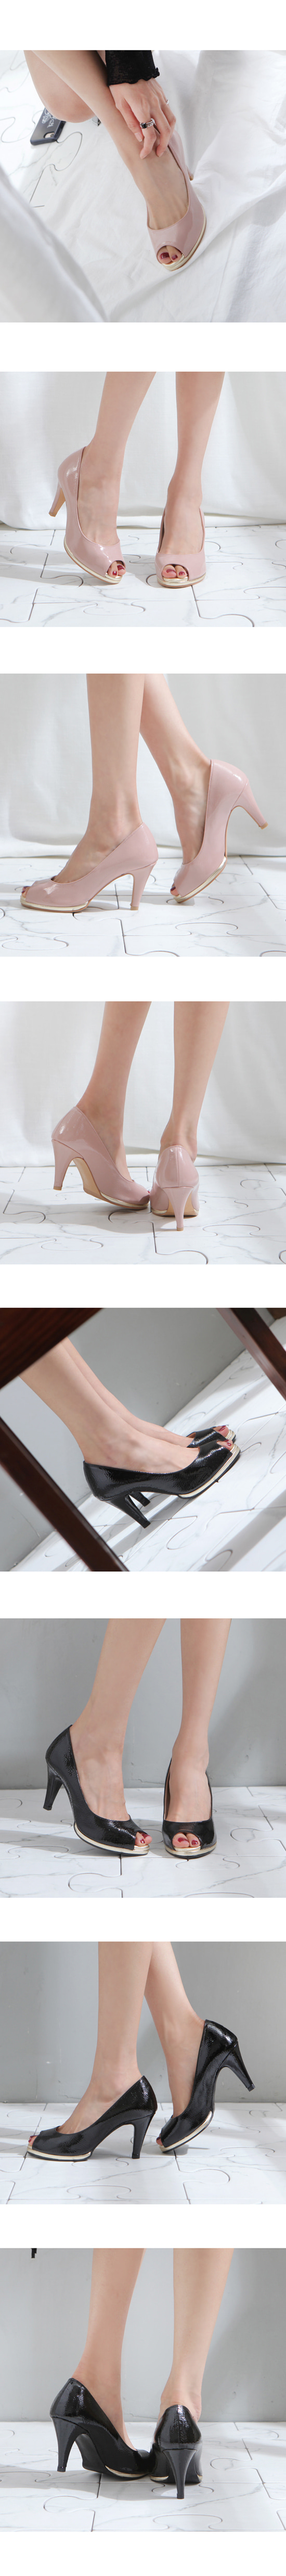 Enamel Toe Open Heels High Heels